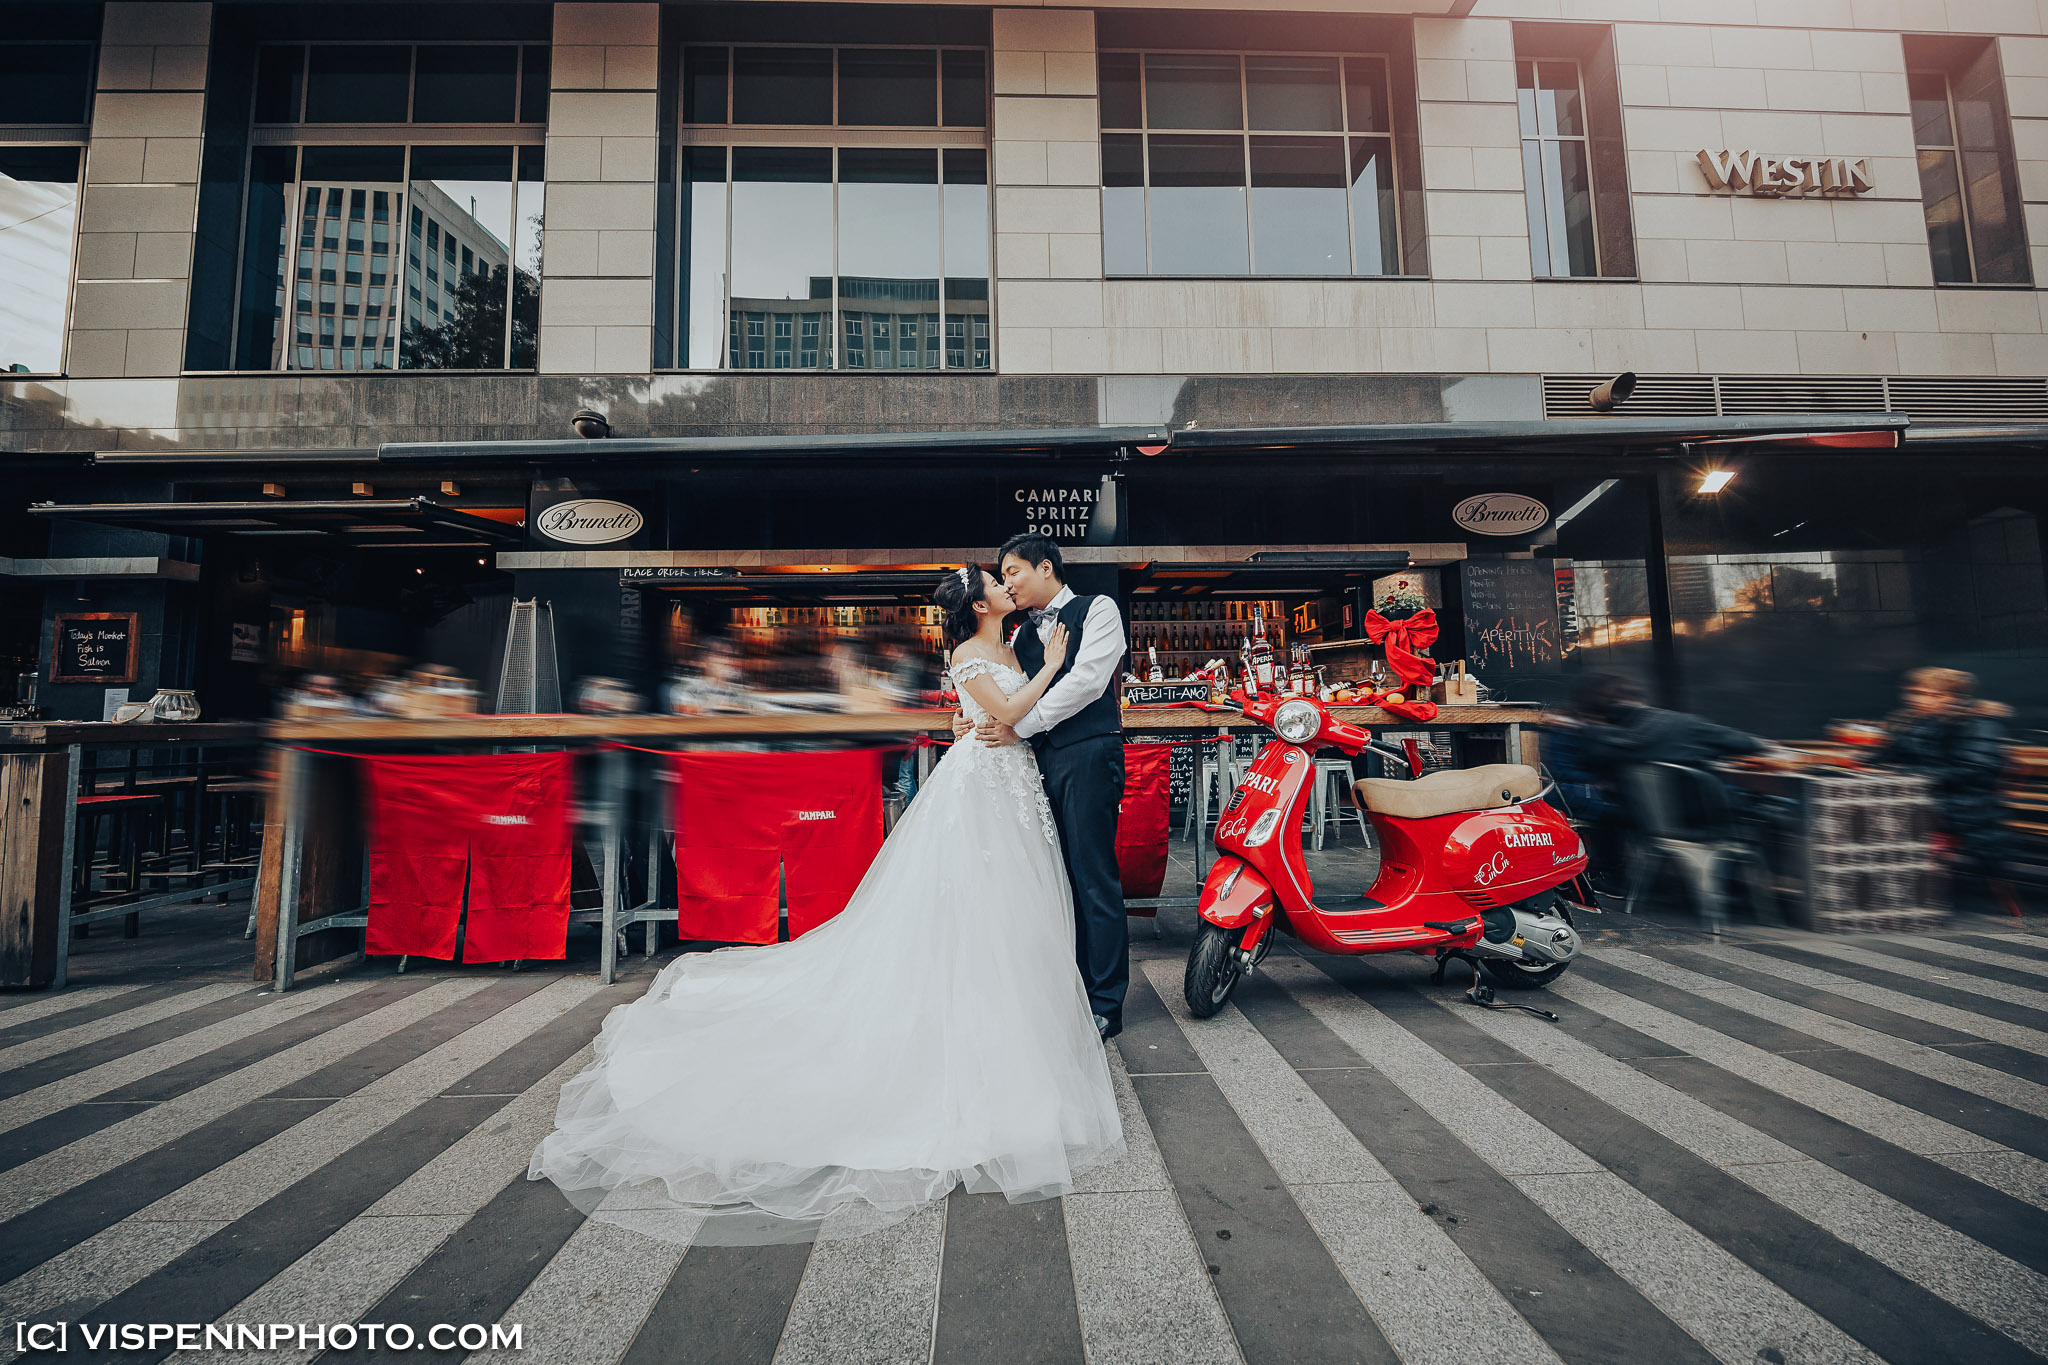 PRE WEDDING Photography Melbourne VISPENN 墨尔本 婚纱照 结婚照 婚纱摄影 VISPENN CX 3077